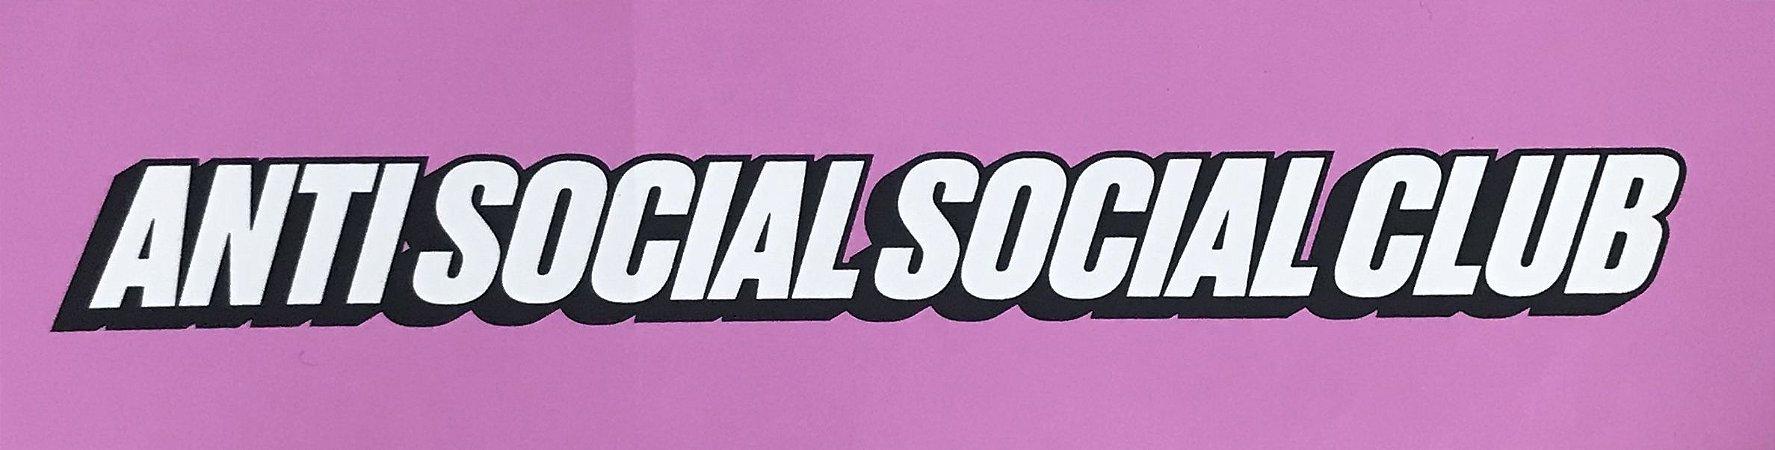 "ANTI SOCIAL SOCIAL CLUB - Adesivo Logo ""Pink"""